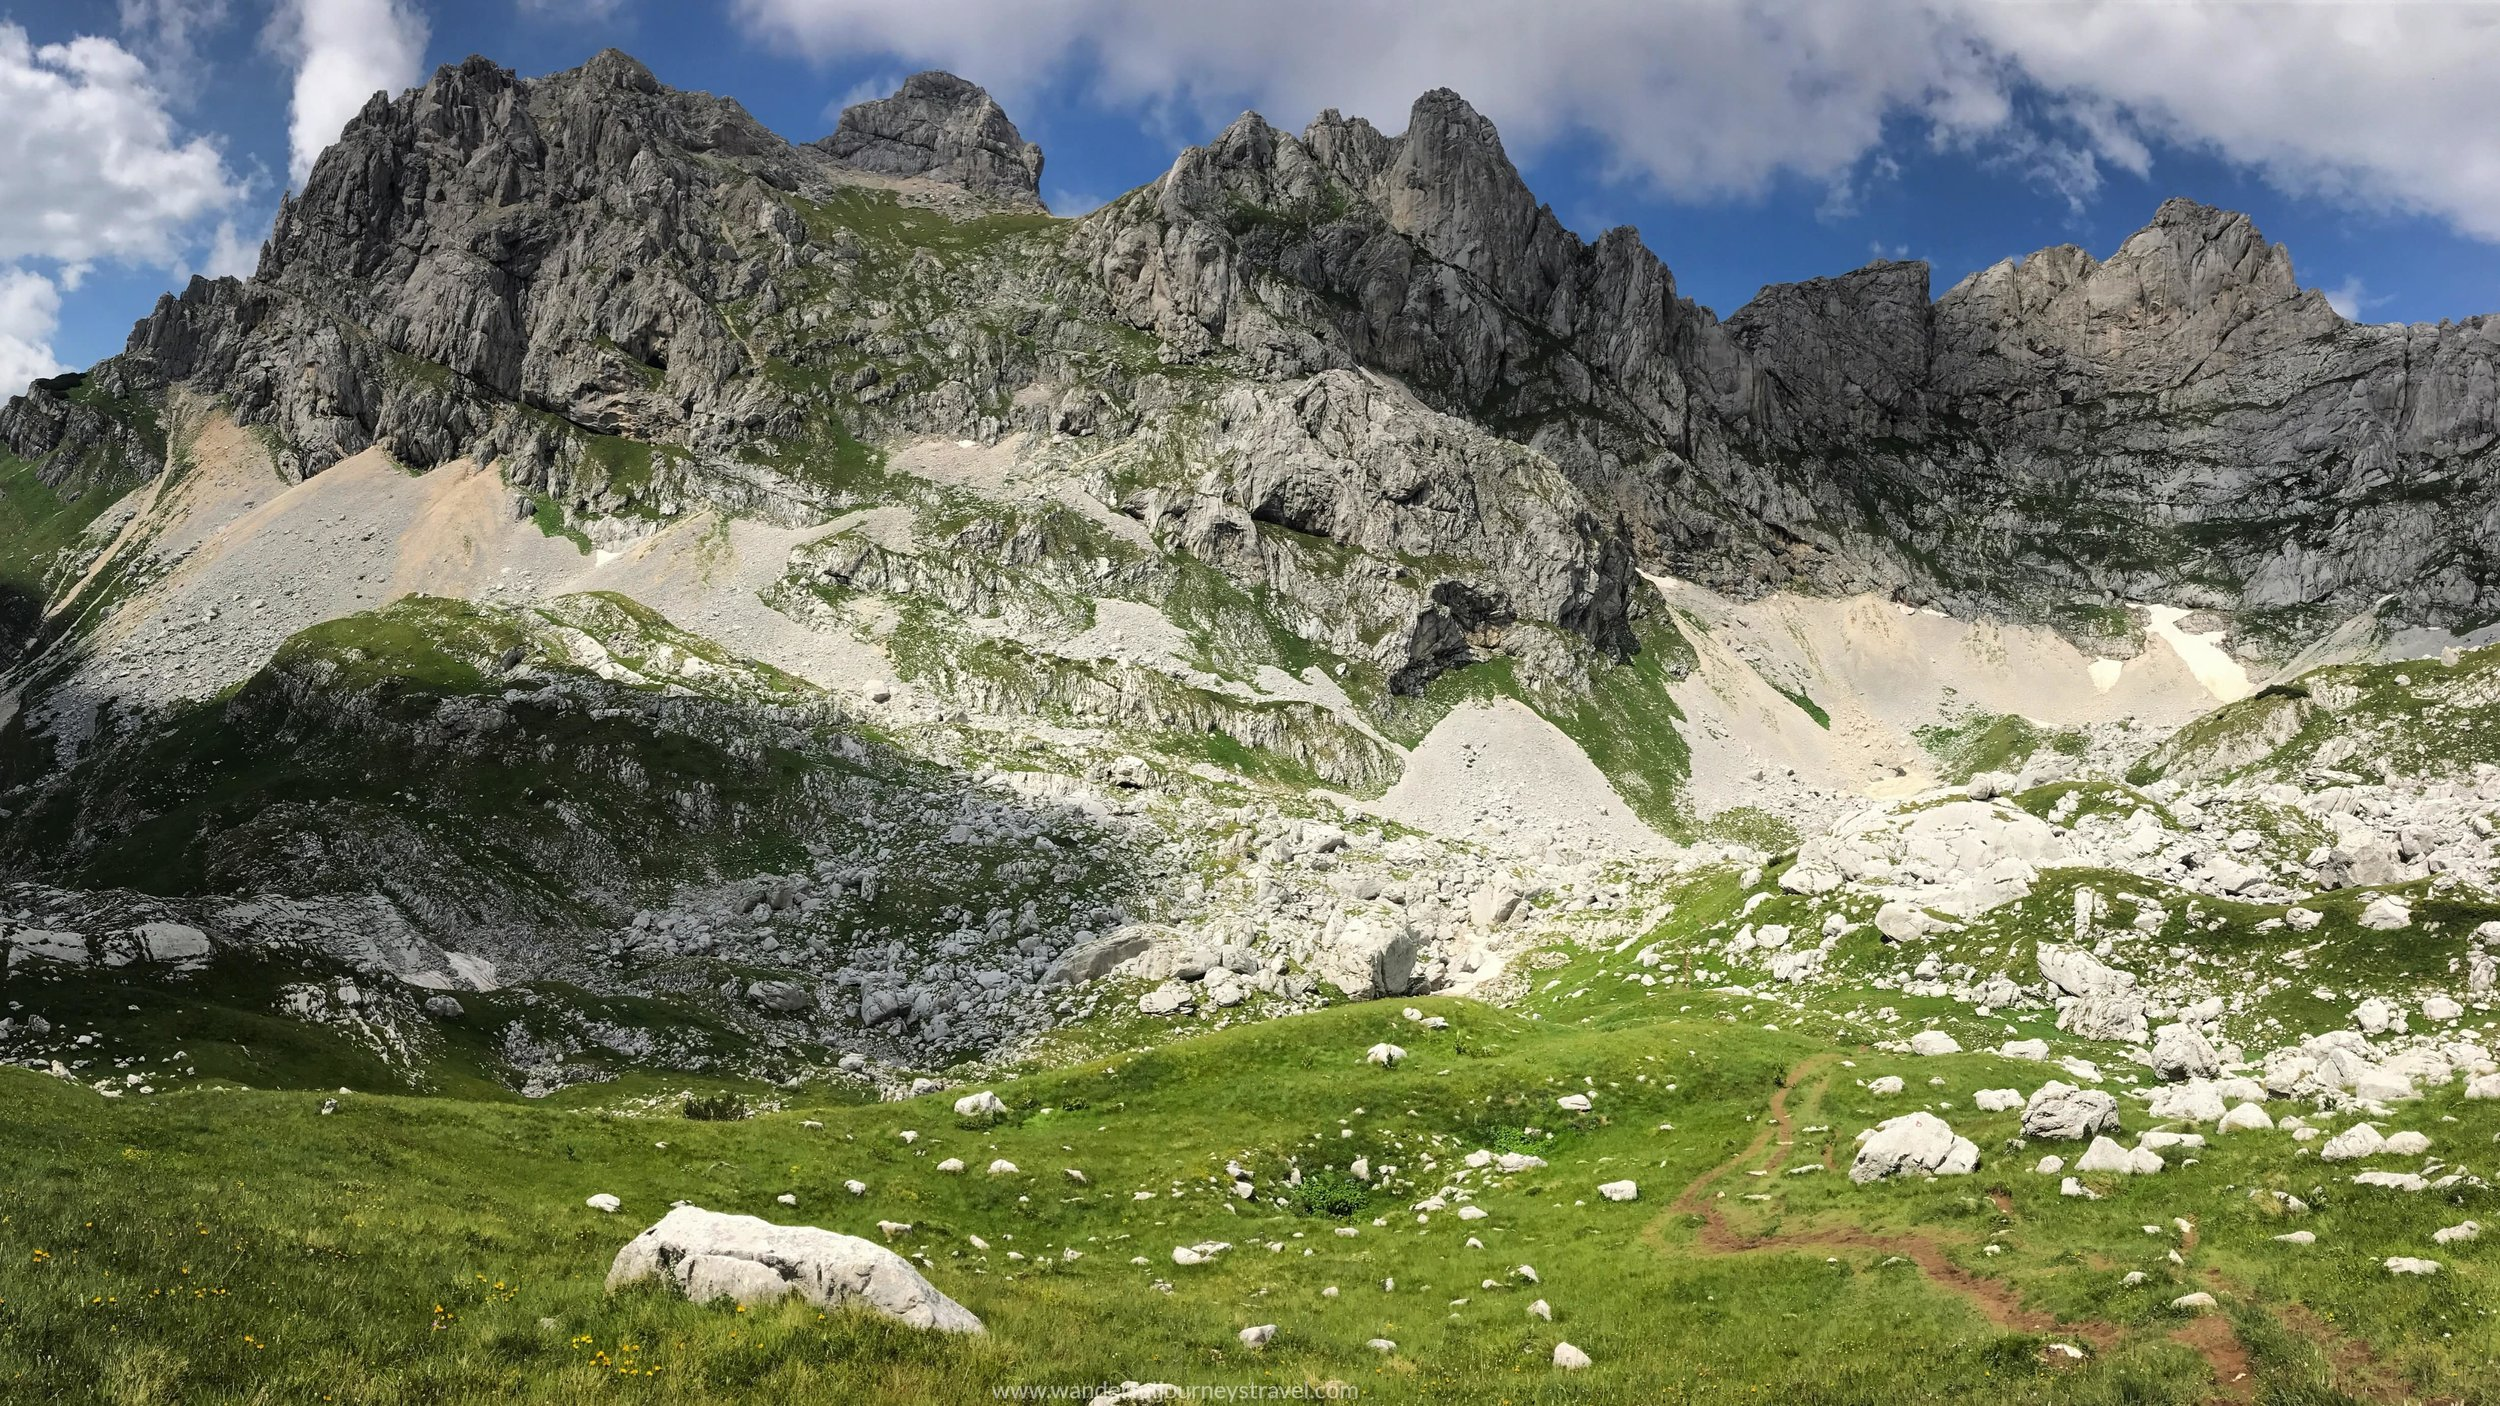 sedlo-view-hike-bobotov-kuk-montenegro-durmitor.jpg